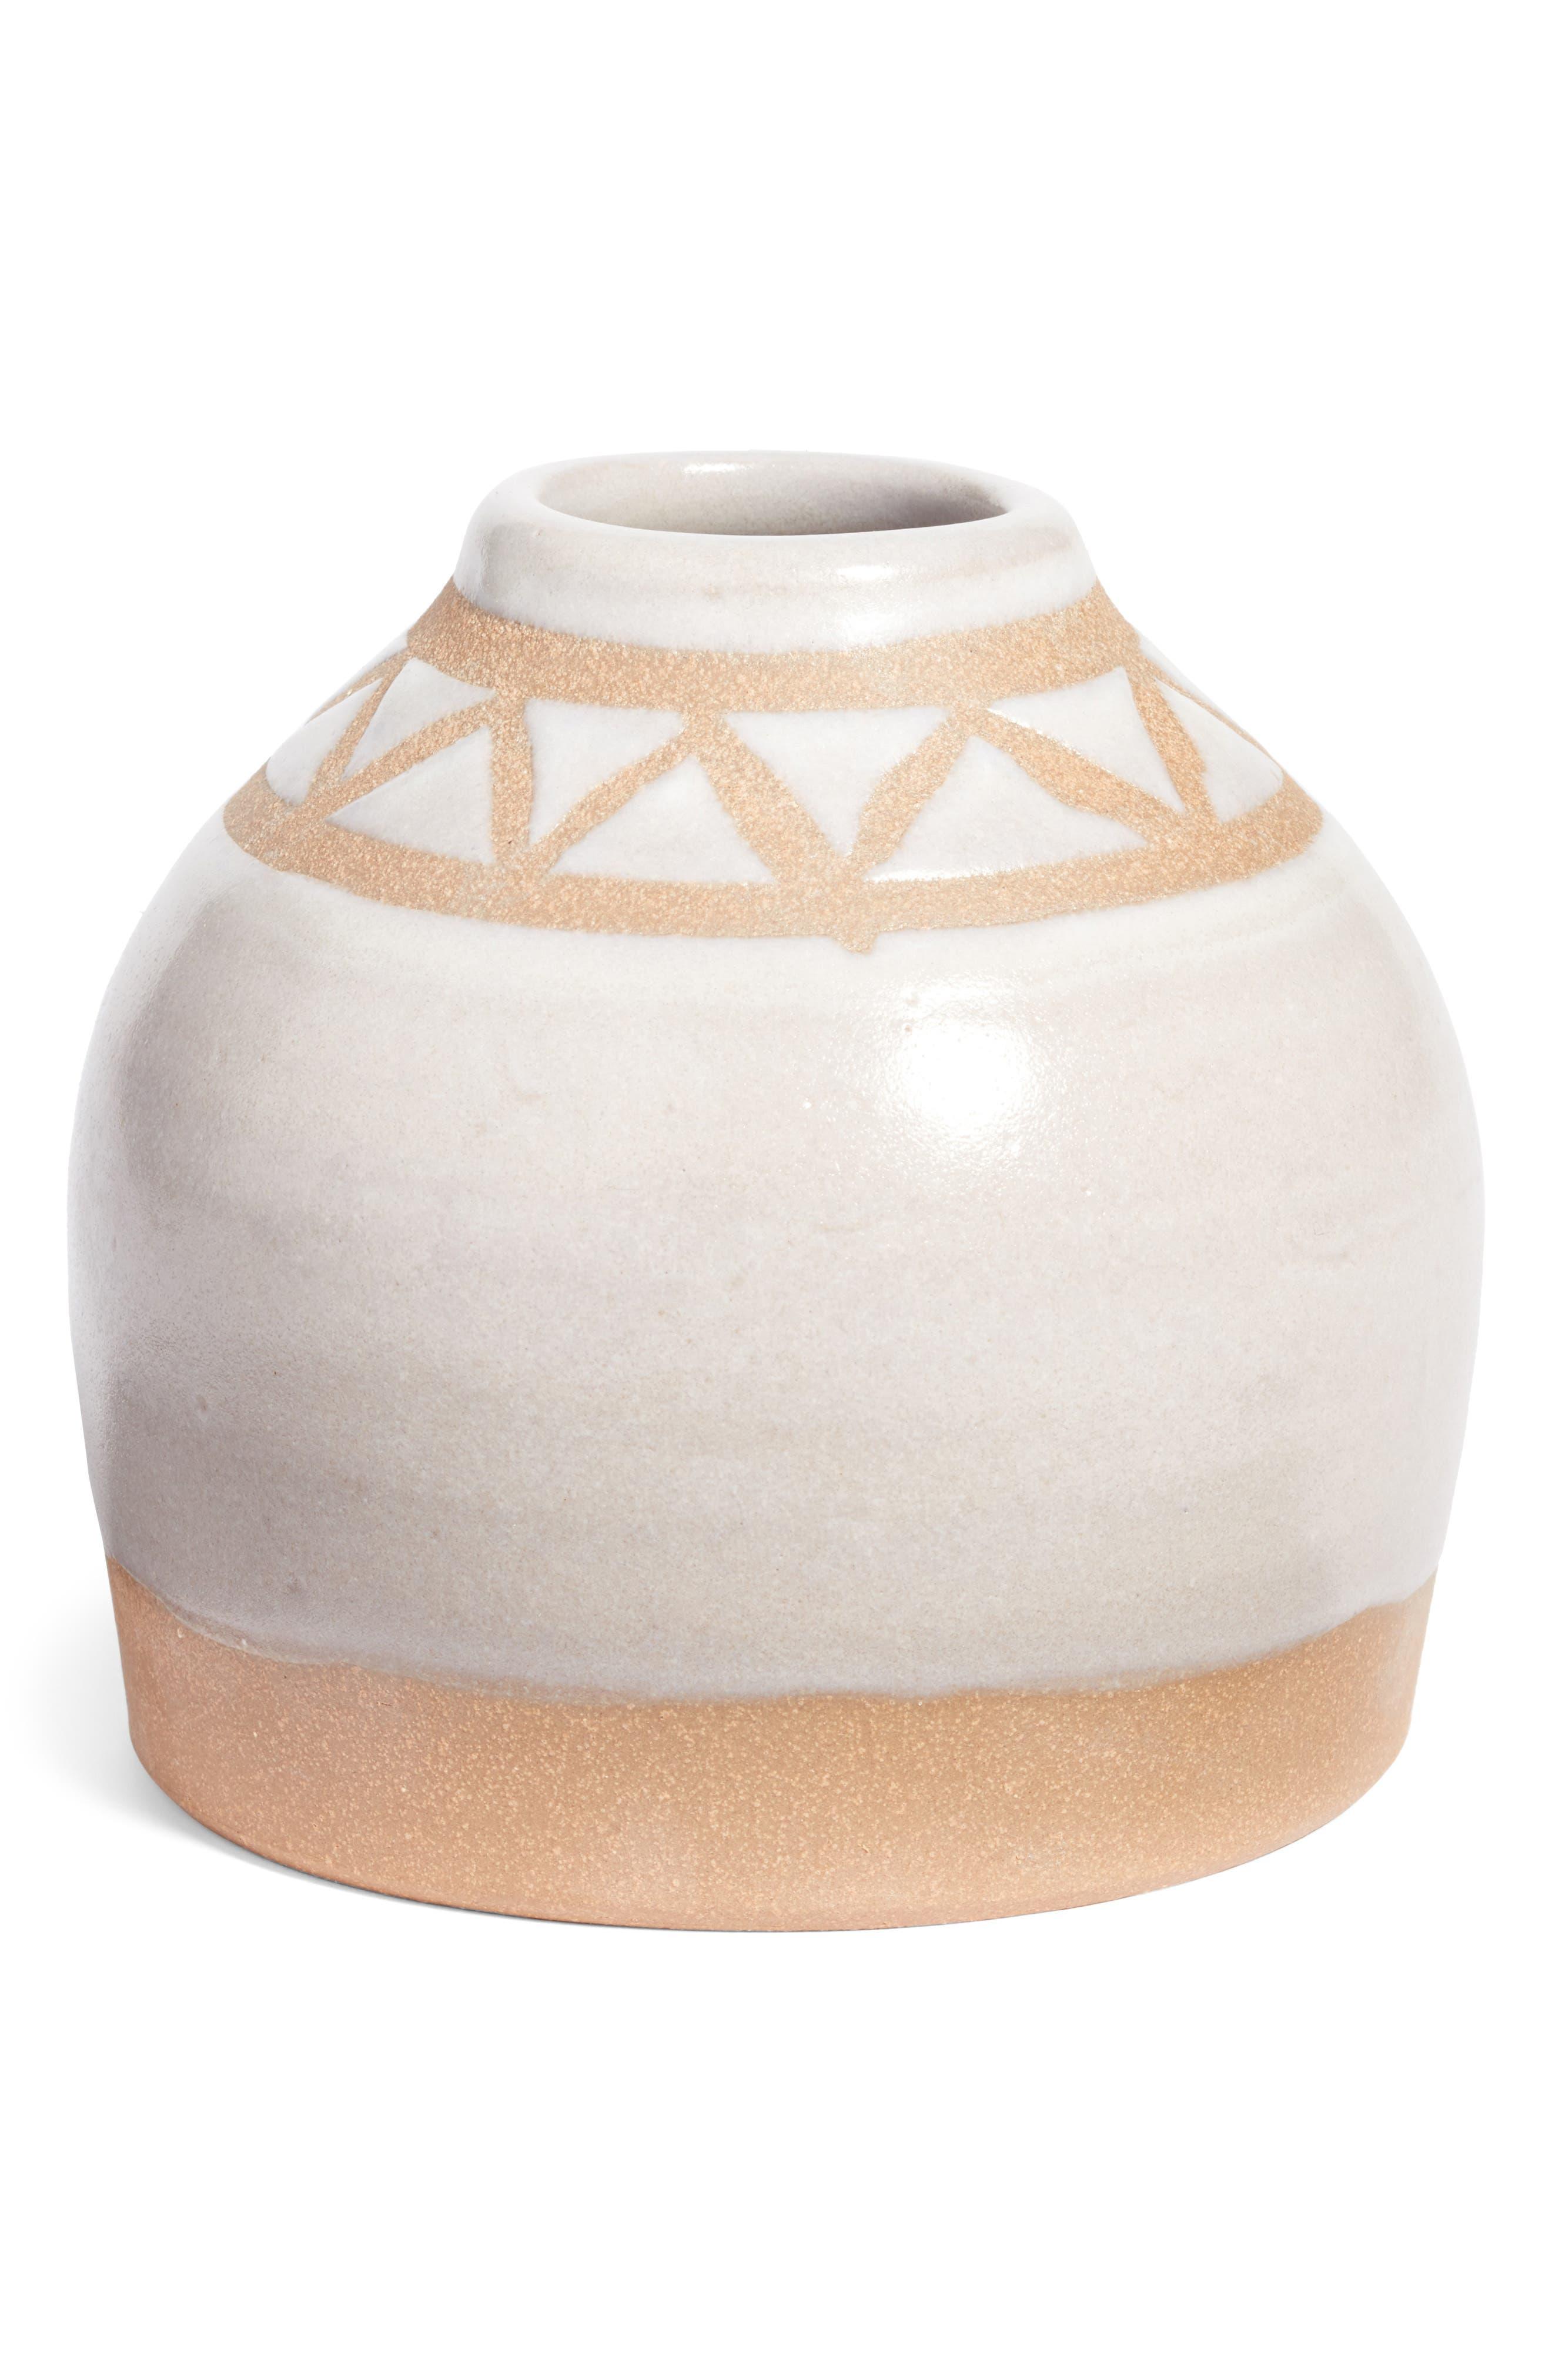 Geo Bud Vase,                             Main thumbnail 1, color,                             100